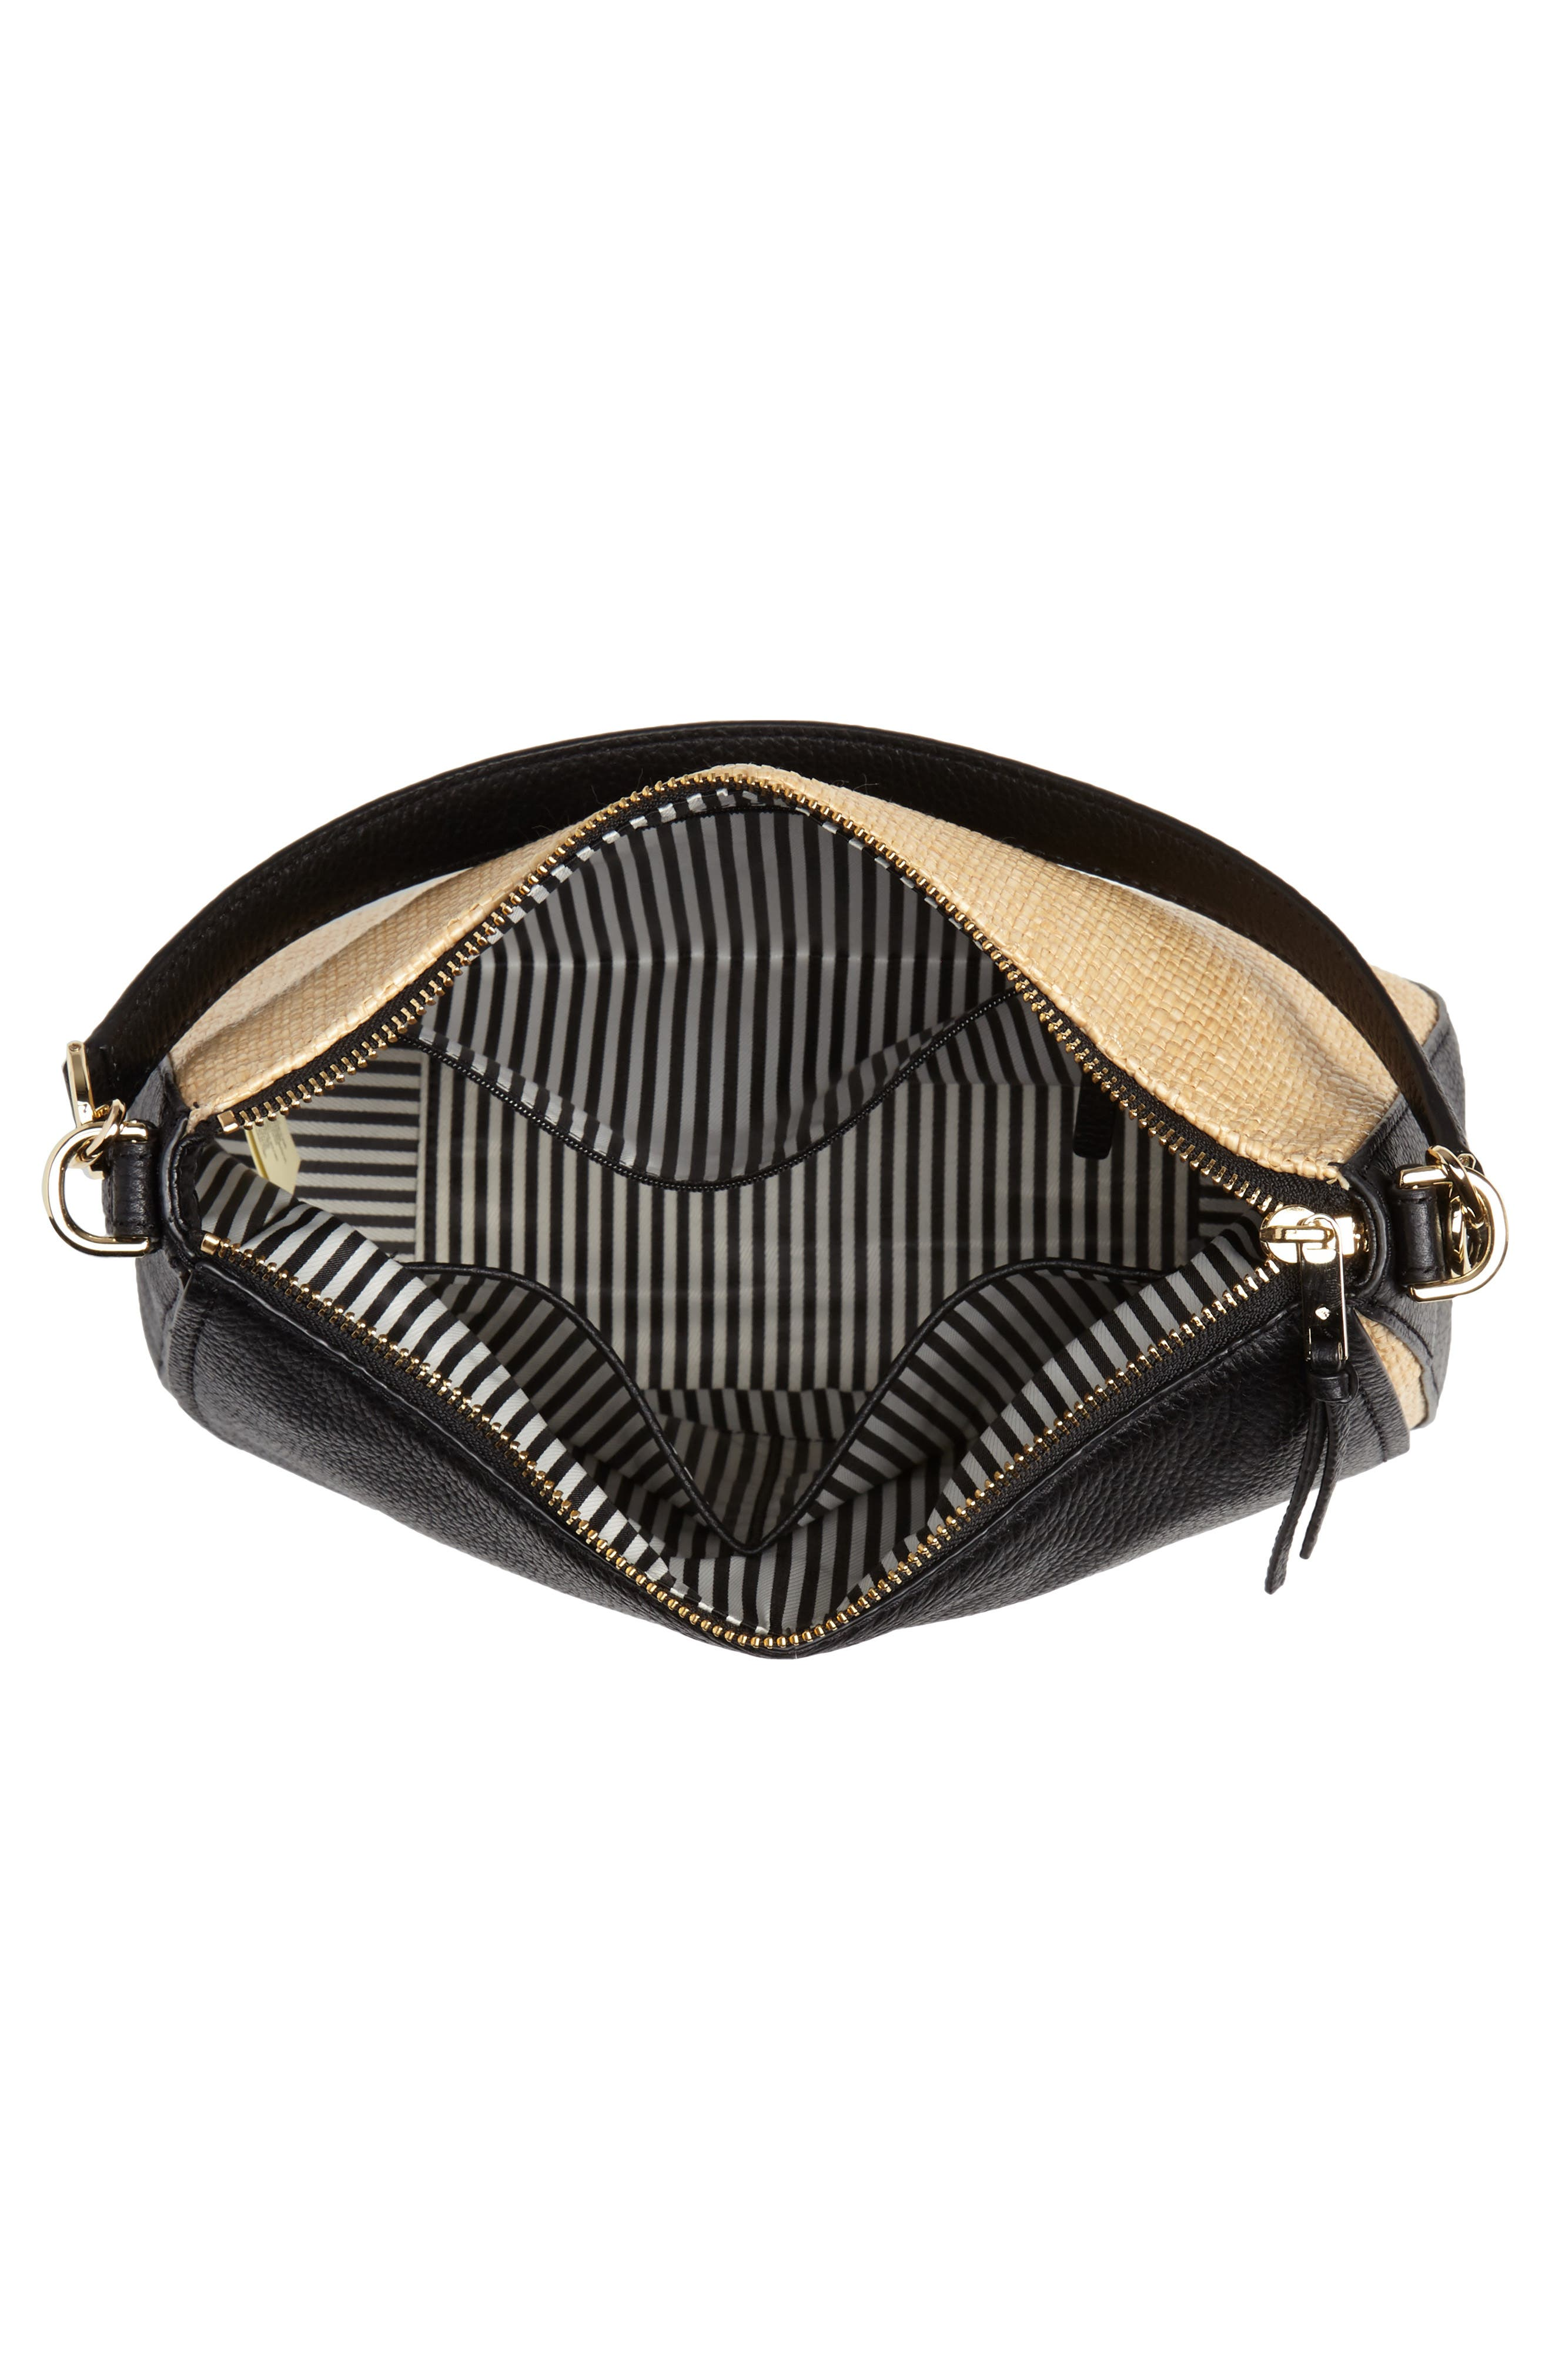 KATE SPADE NEW YORK,                             jackson street - colette straw & leather satchel,                             Alternate thumbnail 4, color,                             257